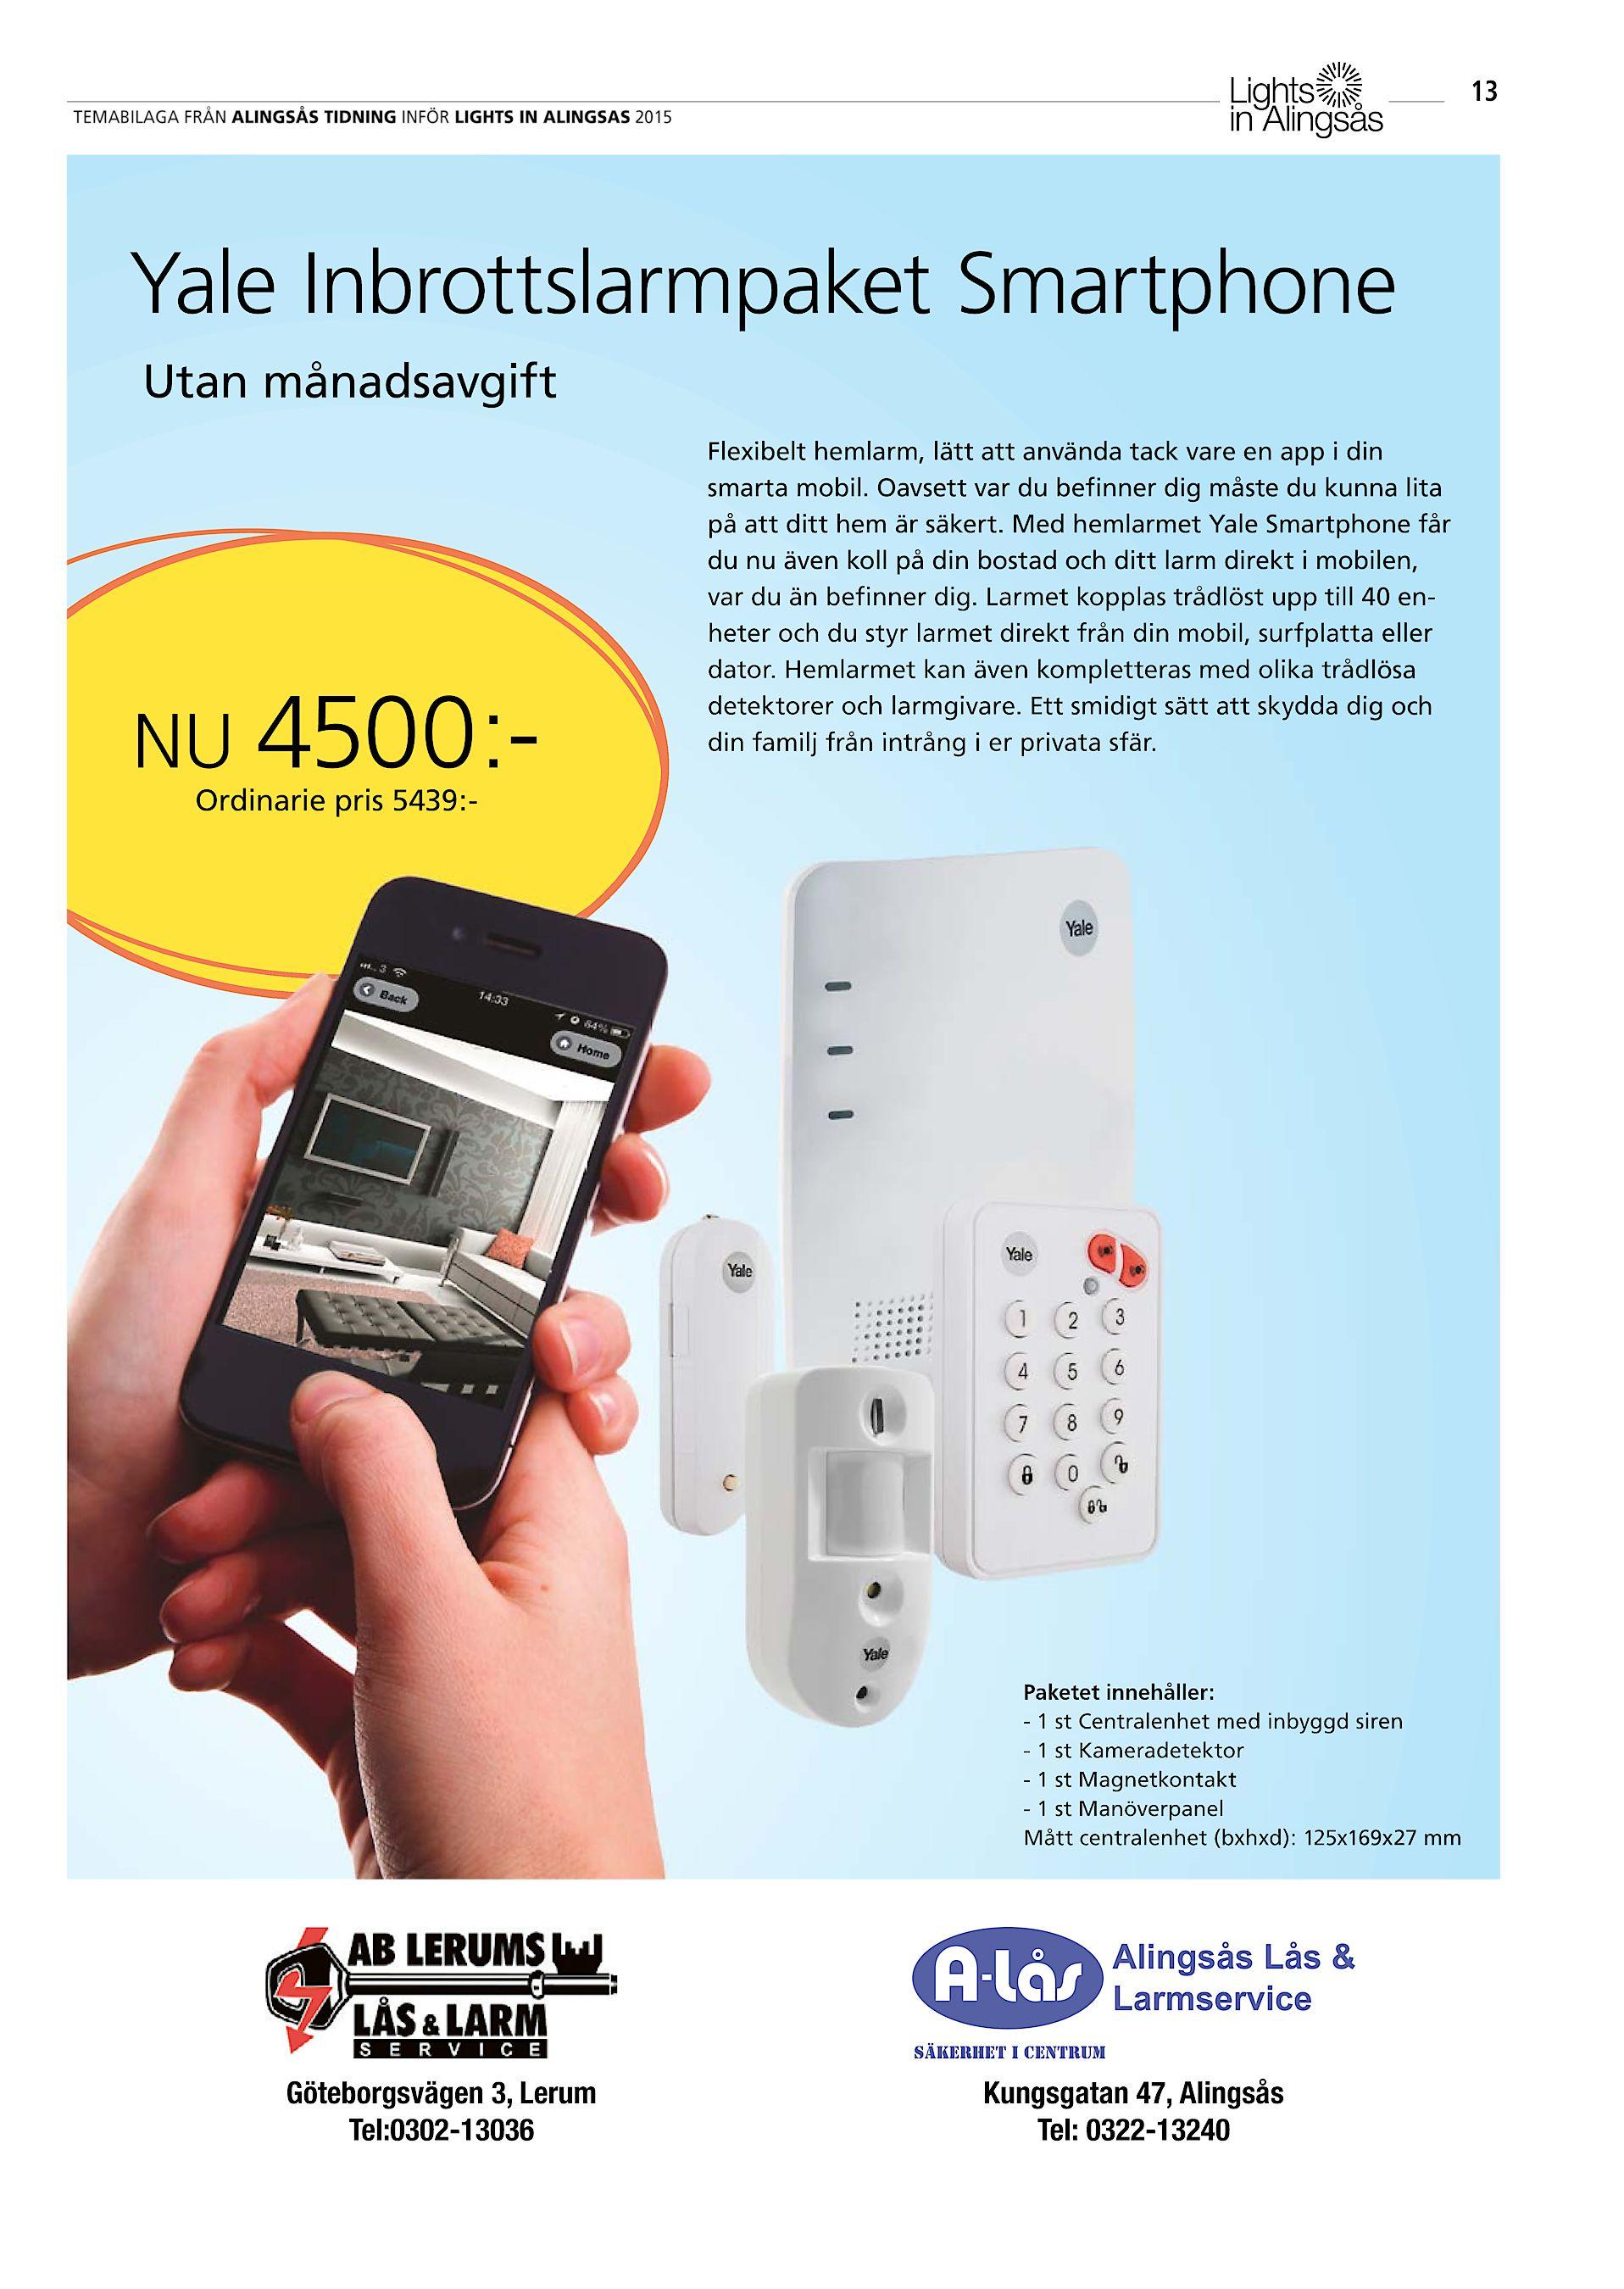 Tredje generationens mobiltelefoni febril aktivitet i europa